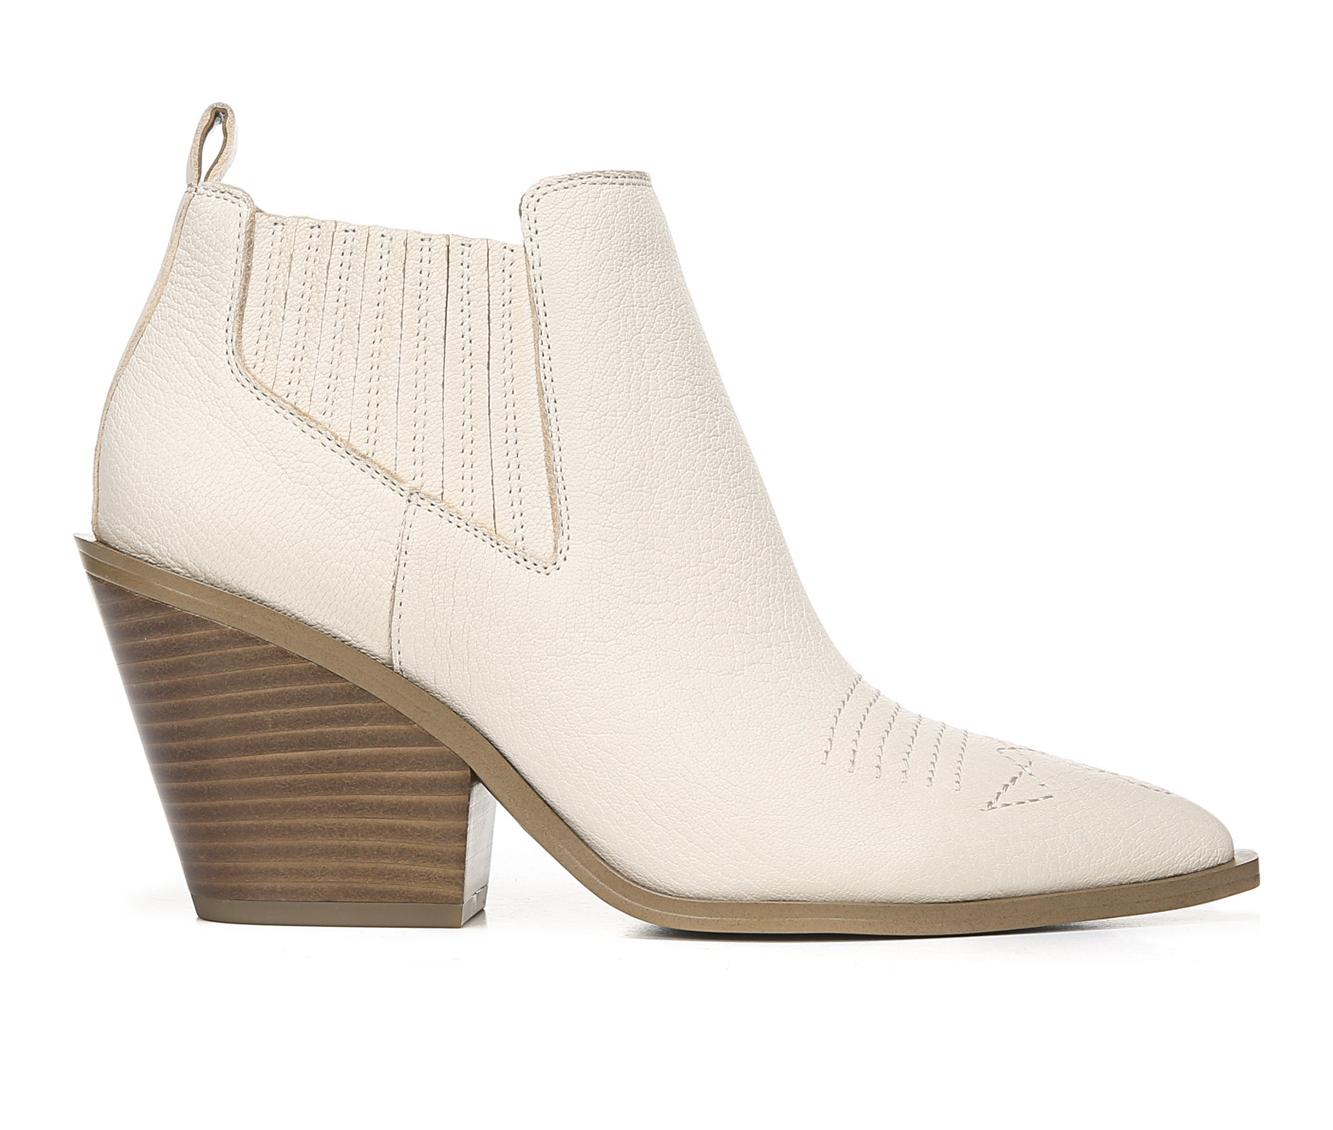 Franco Sarto Cavallarie Women's Boot (White Leather)